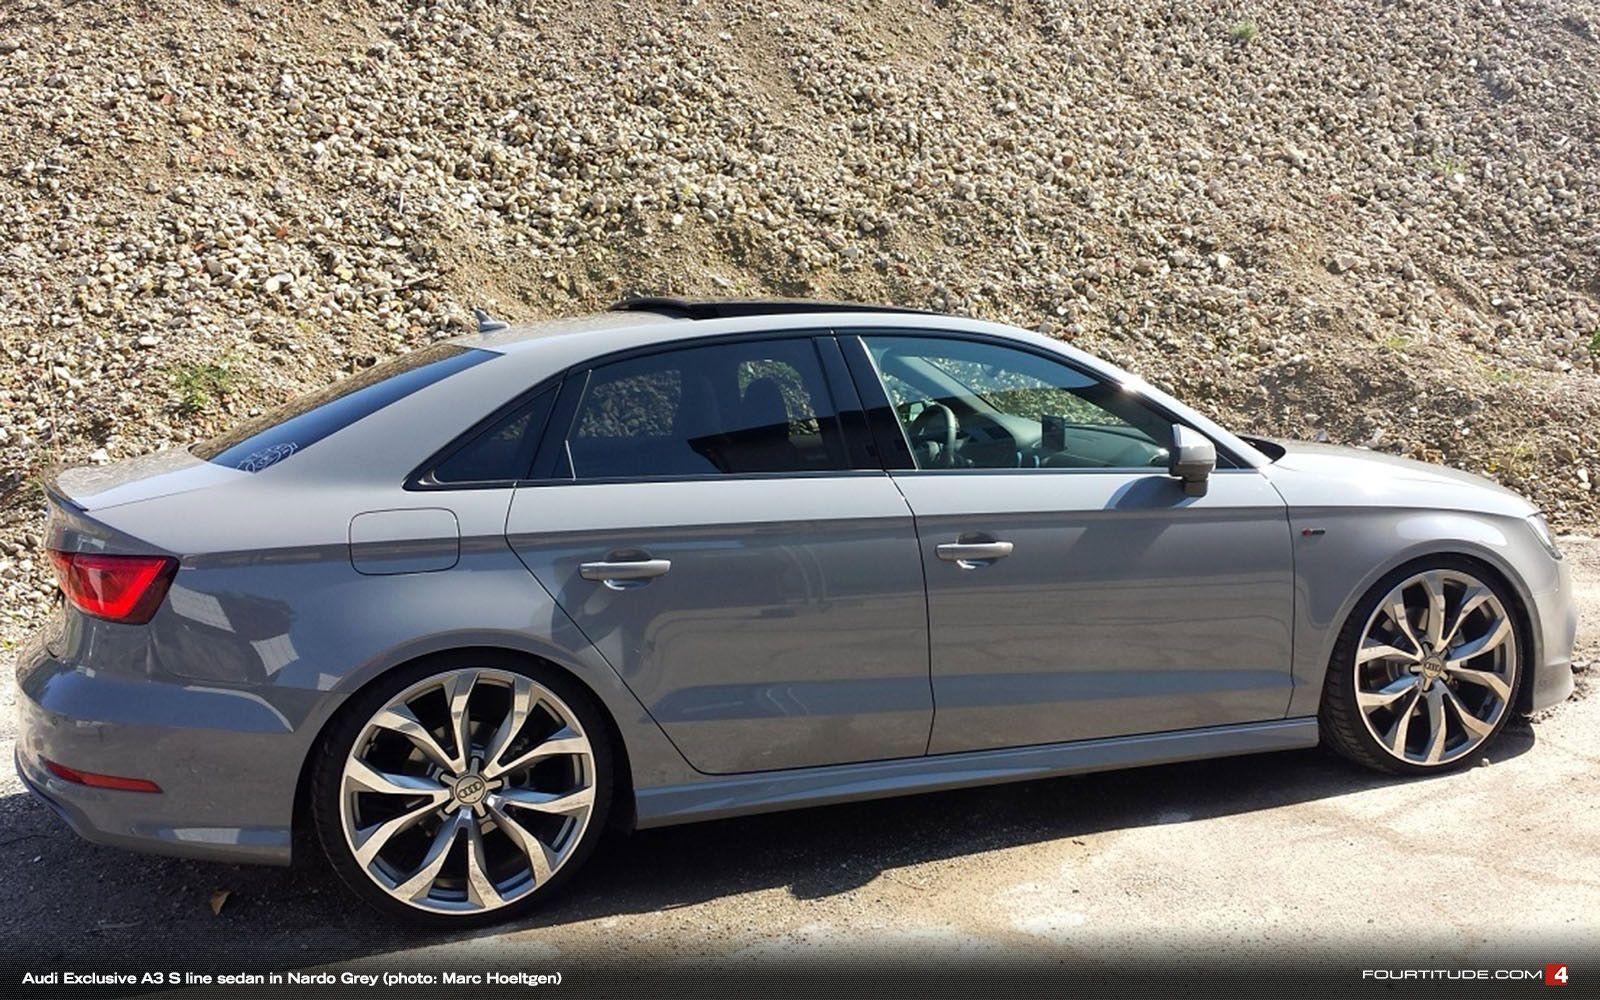 Nardo Grey Audi A3 Sedan Audi Pinterest Cars, Audi